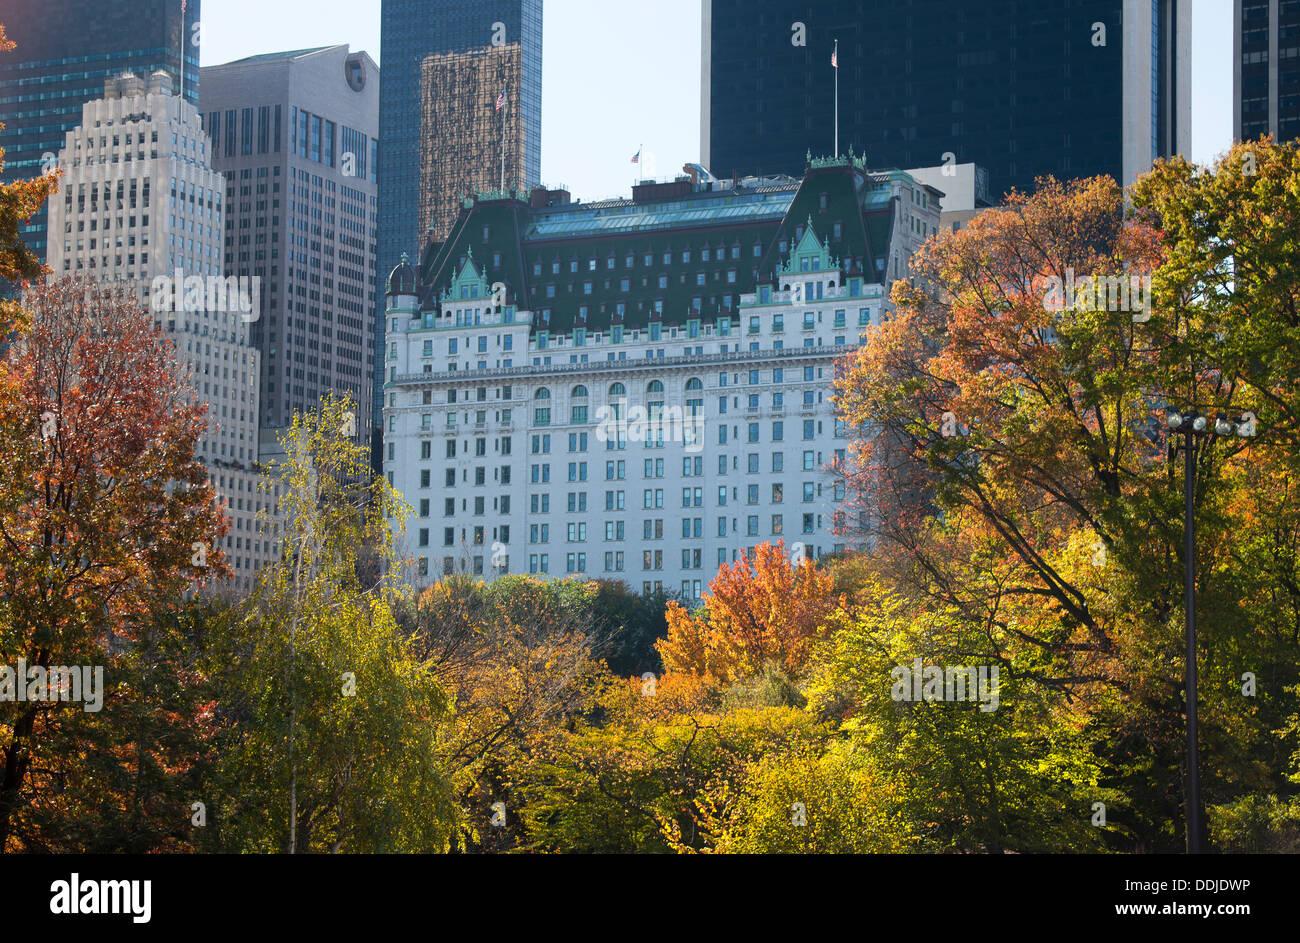 Plaza Hotel Central Park South Midtown Manhattan New York